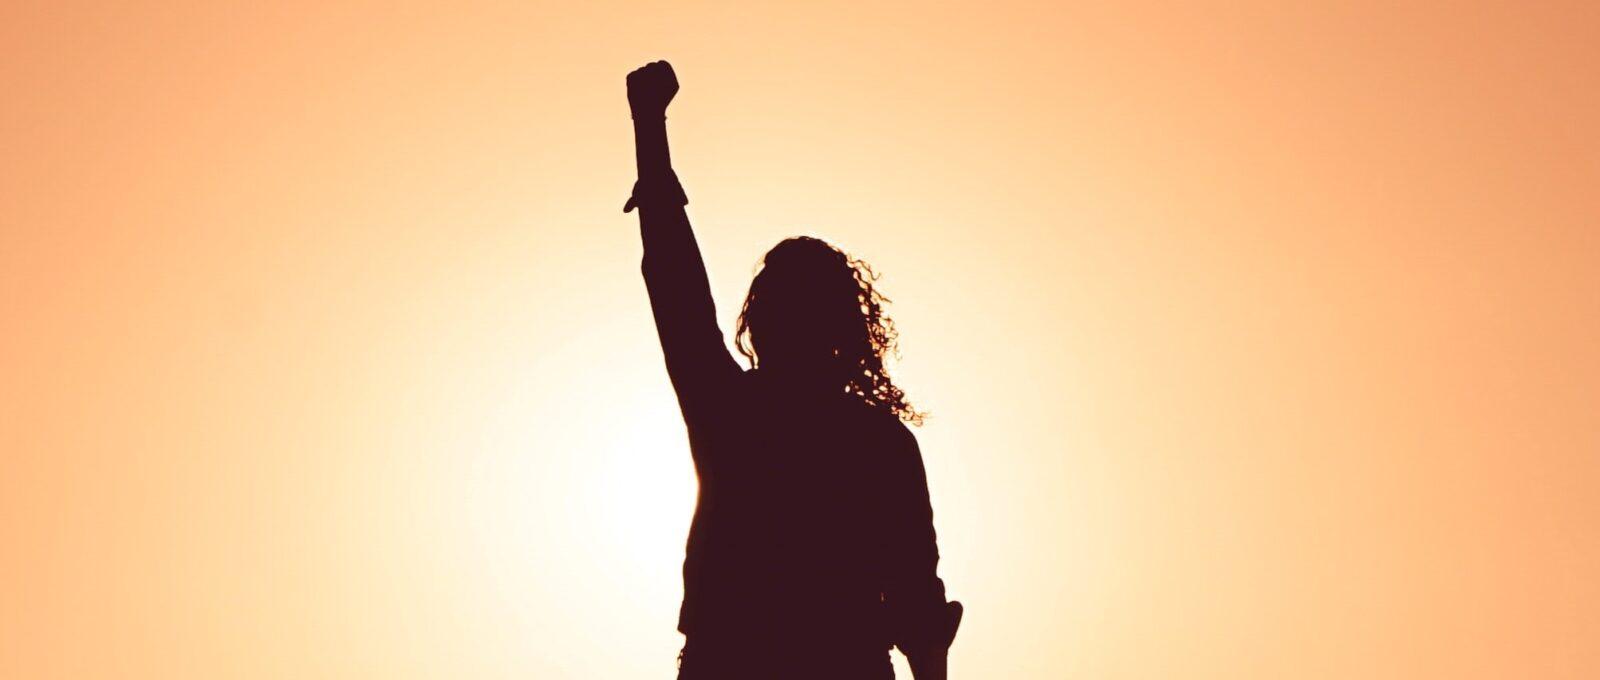 Person raising hand aloft against a sunset